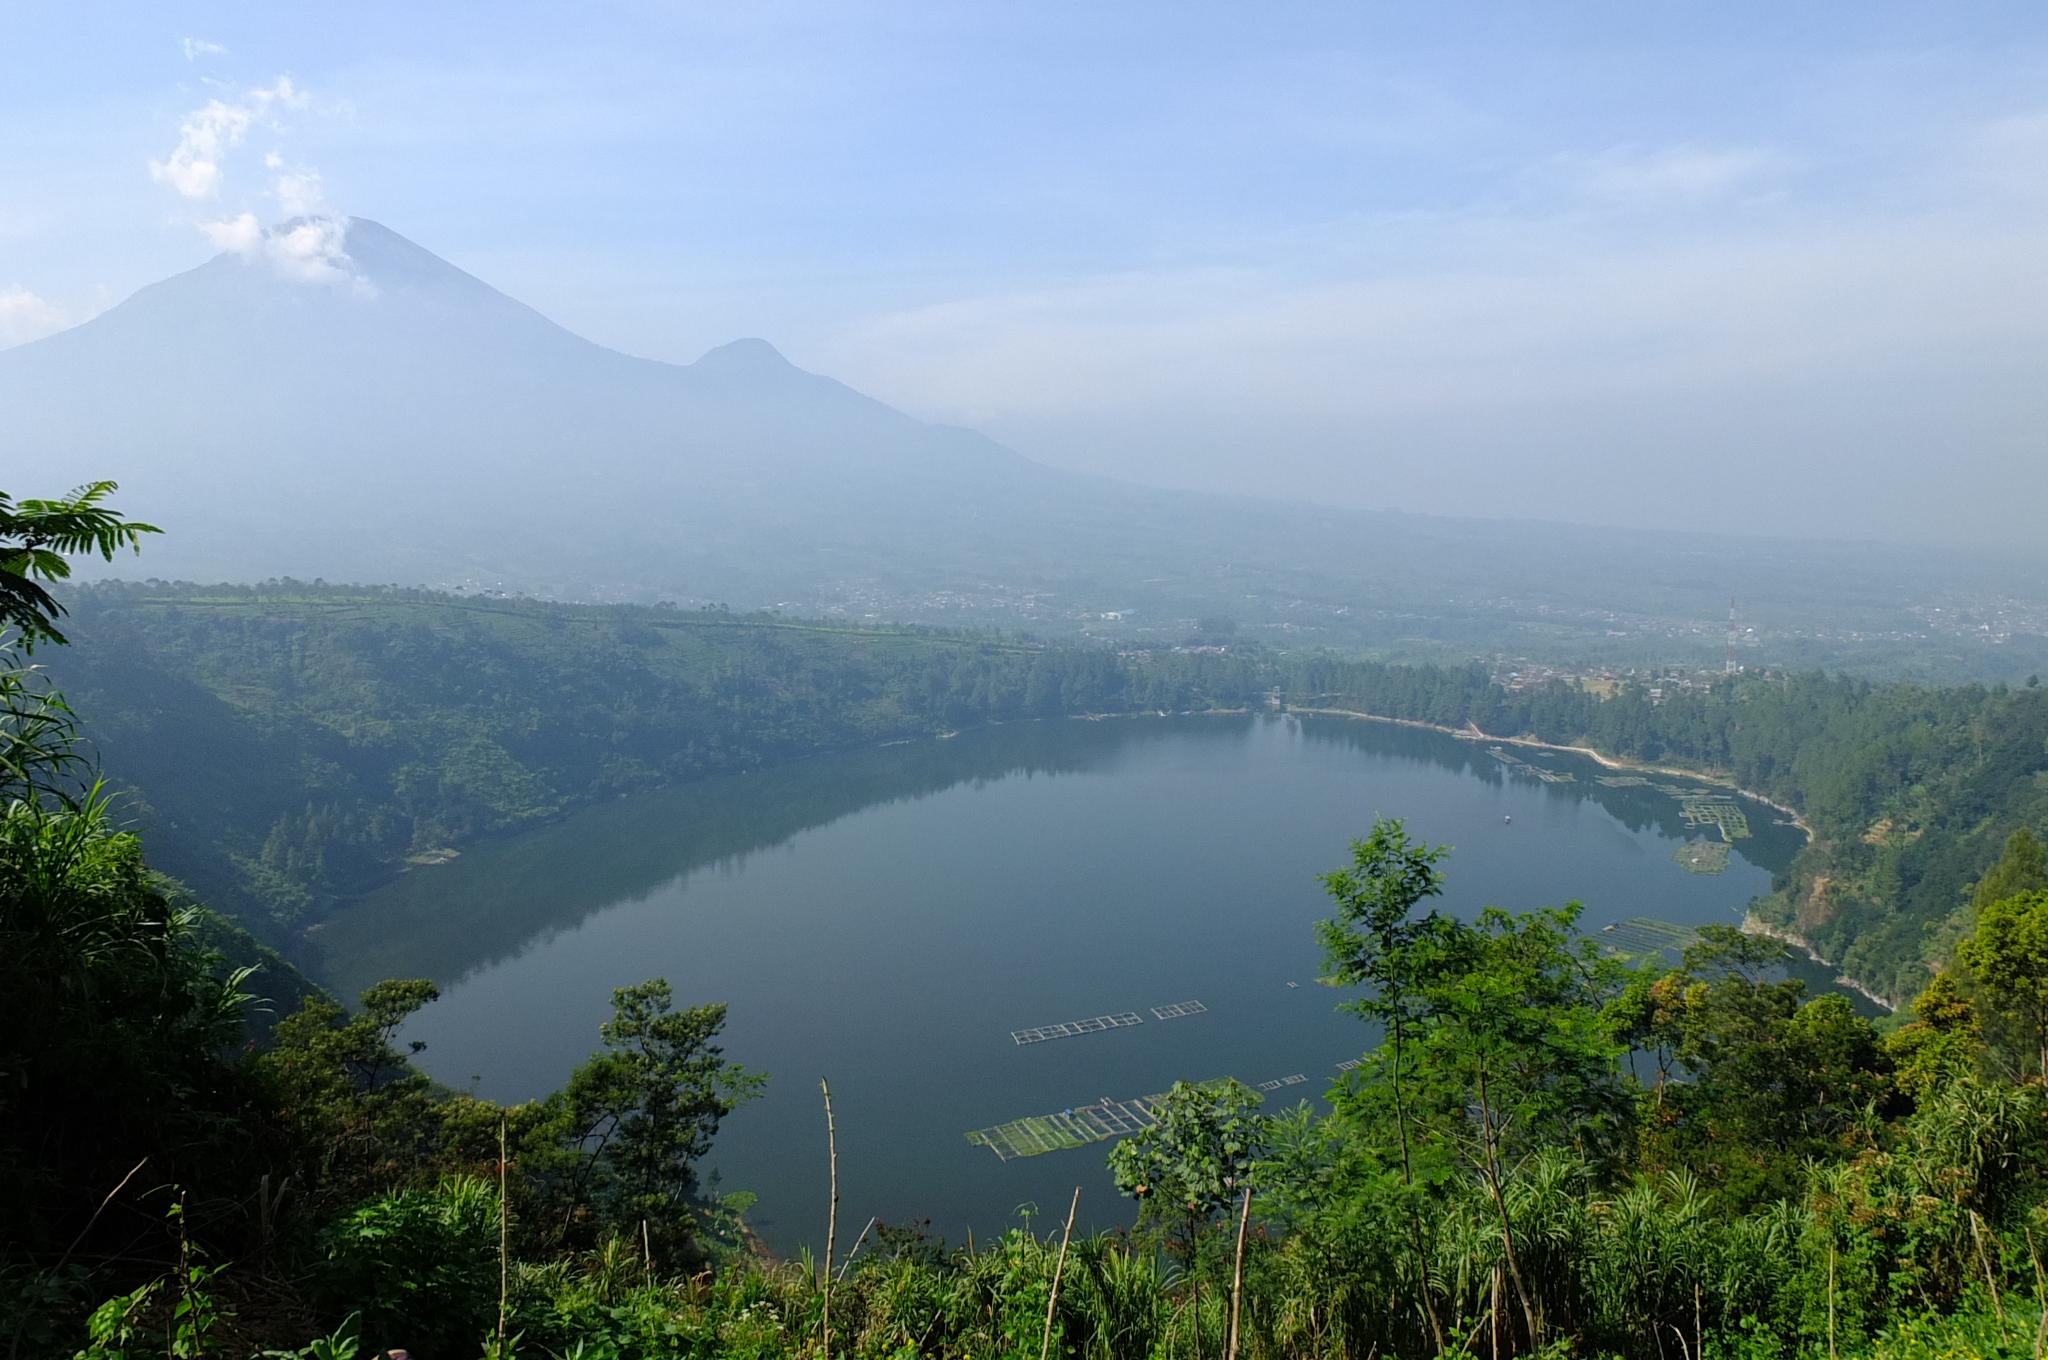 Mendaki Bukit Seroja Dscf1634 Puncak Kab Wonosobo